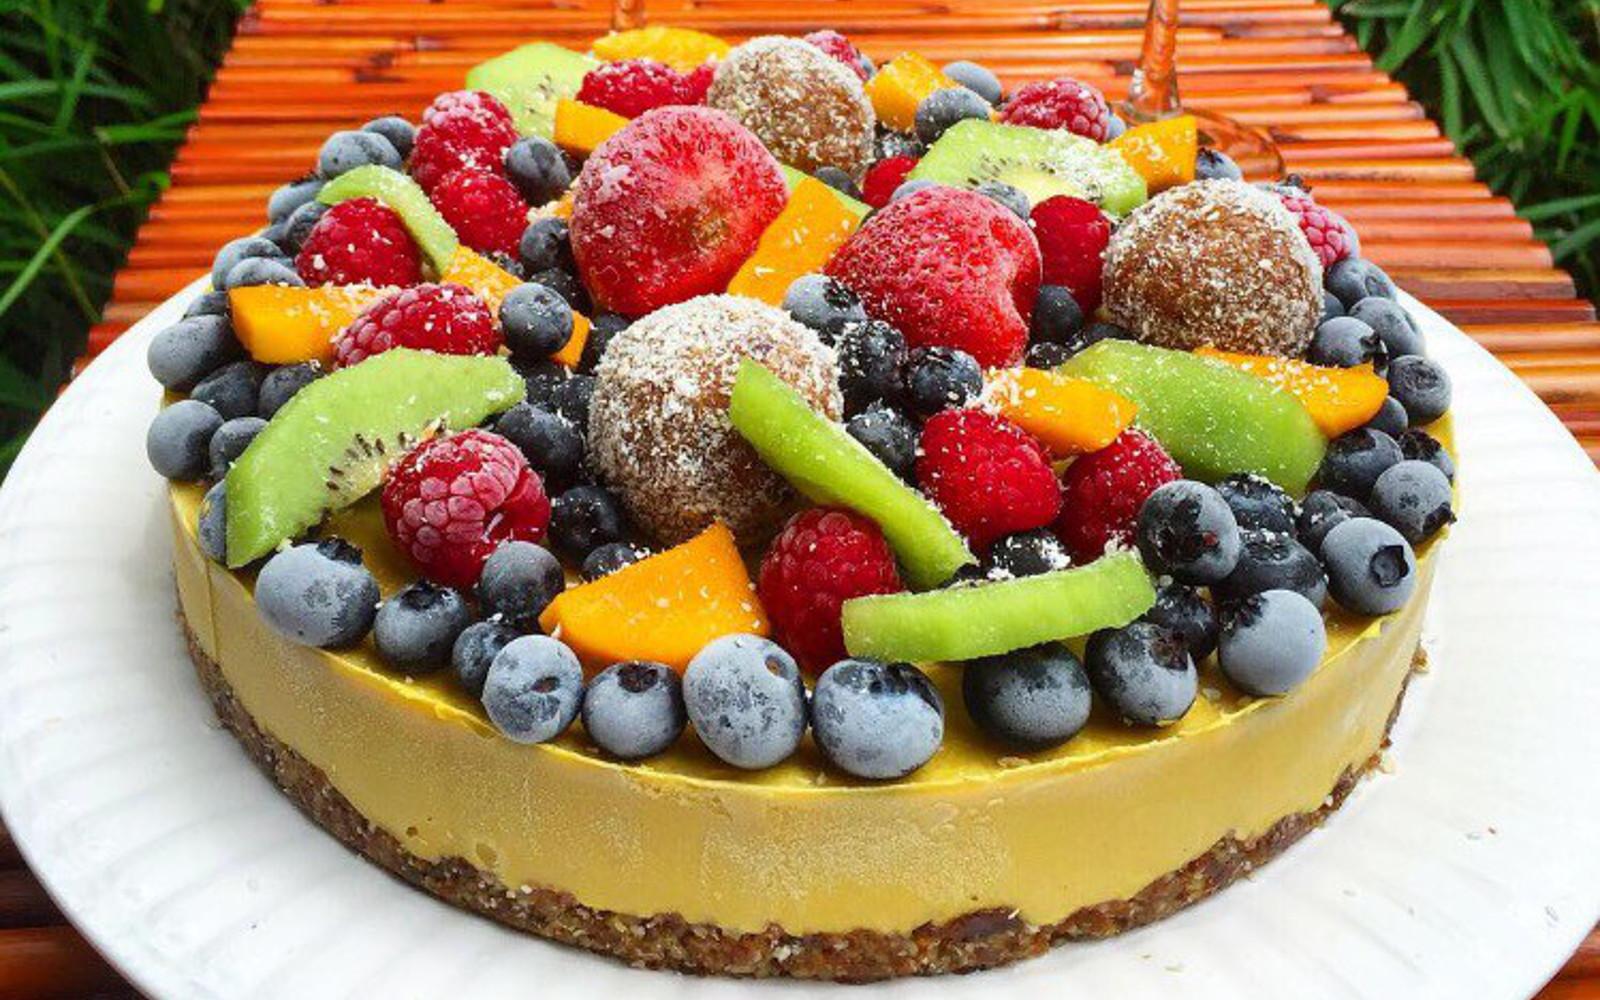 Raw Mango Lime Cheesecake With Fruit Topping [Raw, Vegan, Gluten-Free]